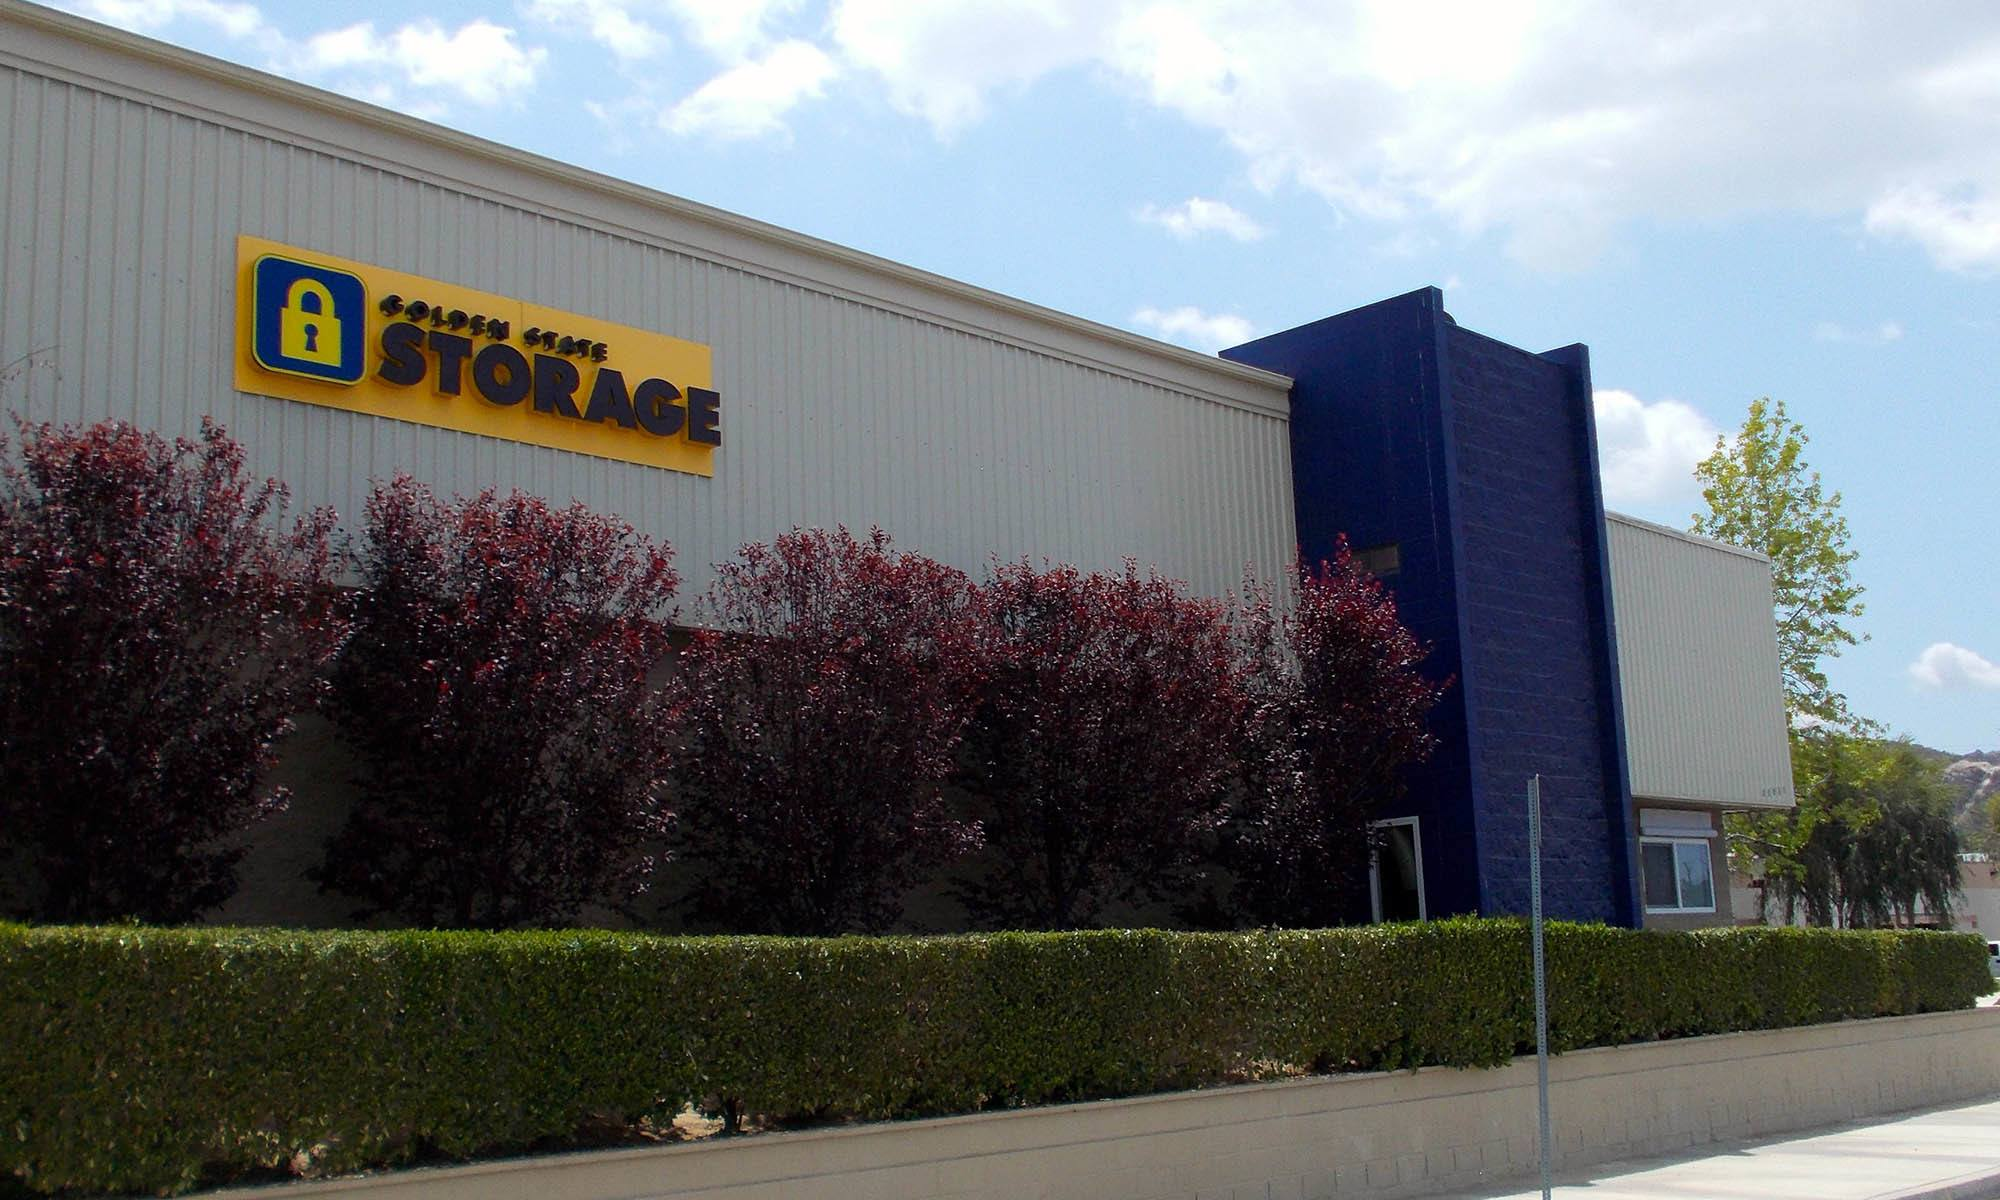 self storage in Santa Clarita california